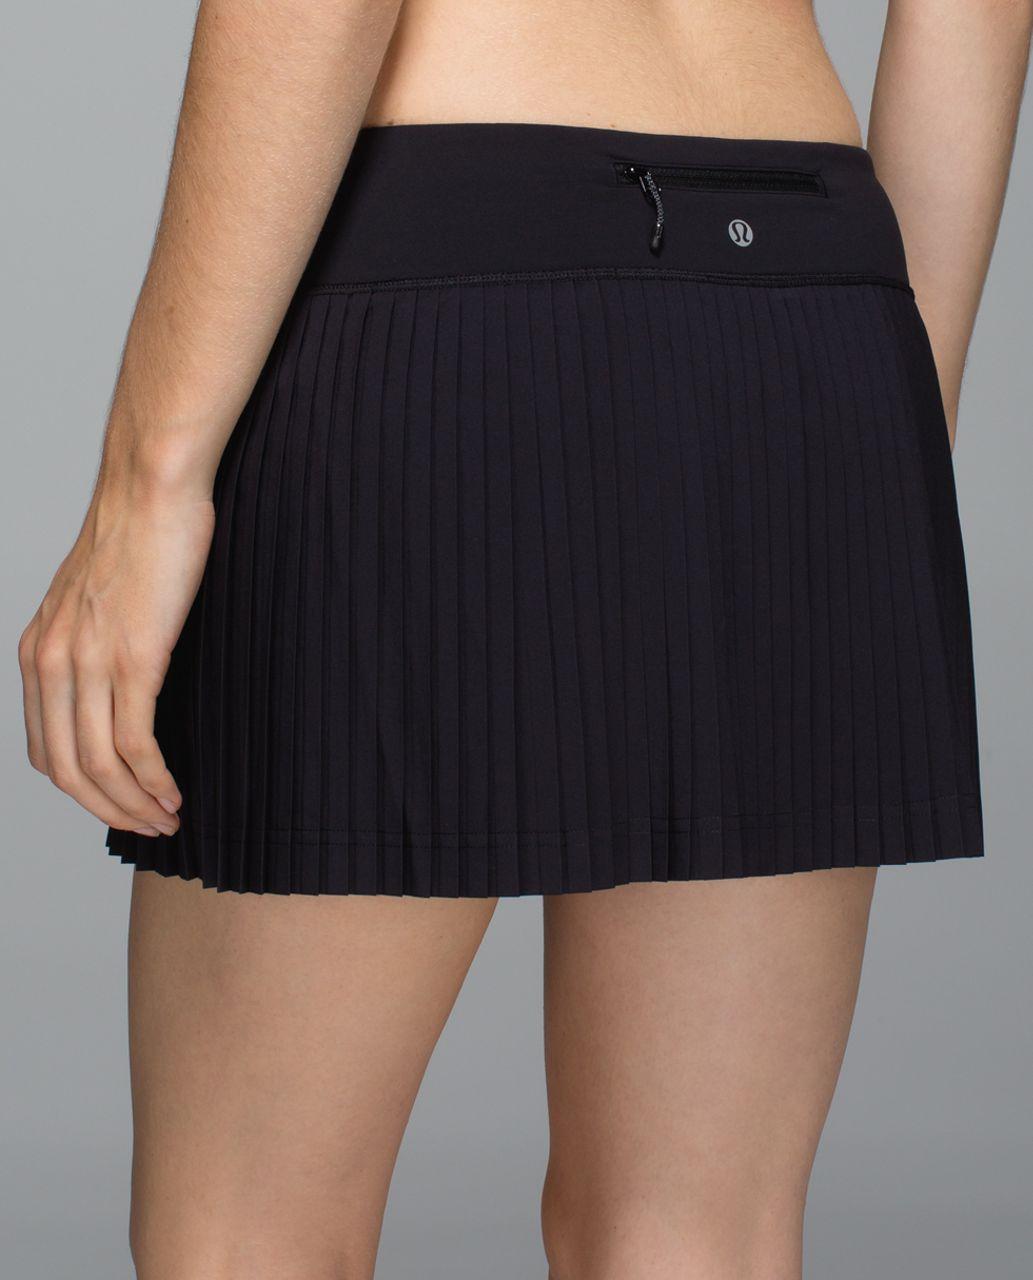 3440ec2cb8 Lululemon Pleat to Street Skirt - Black - lulu fanatics